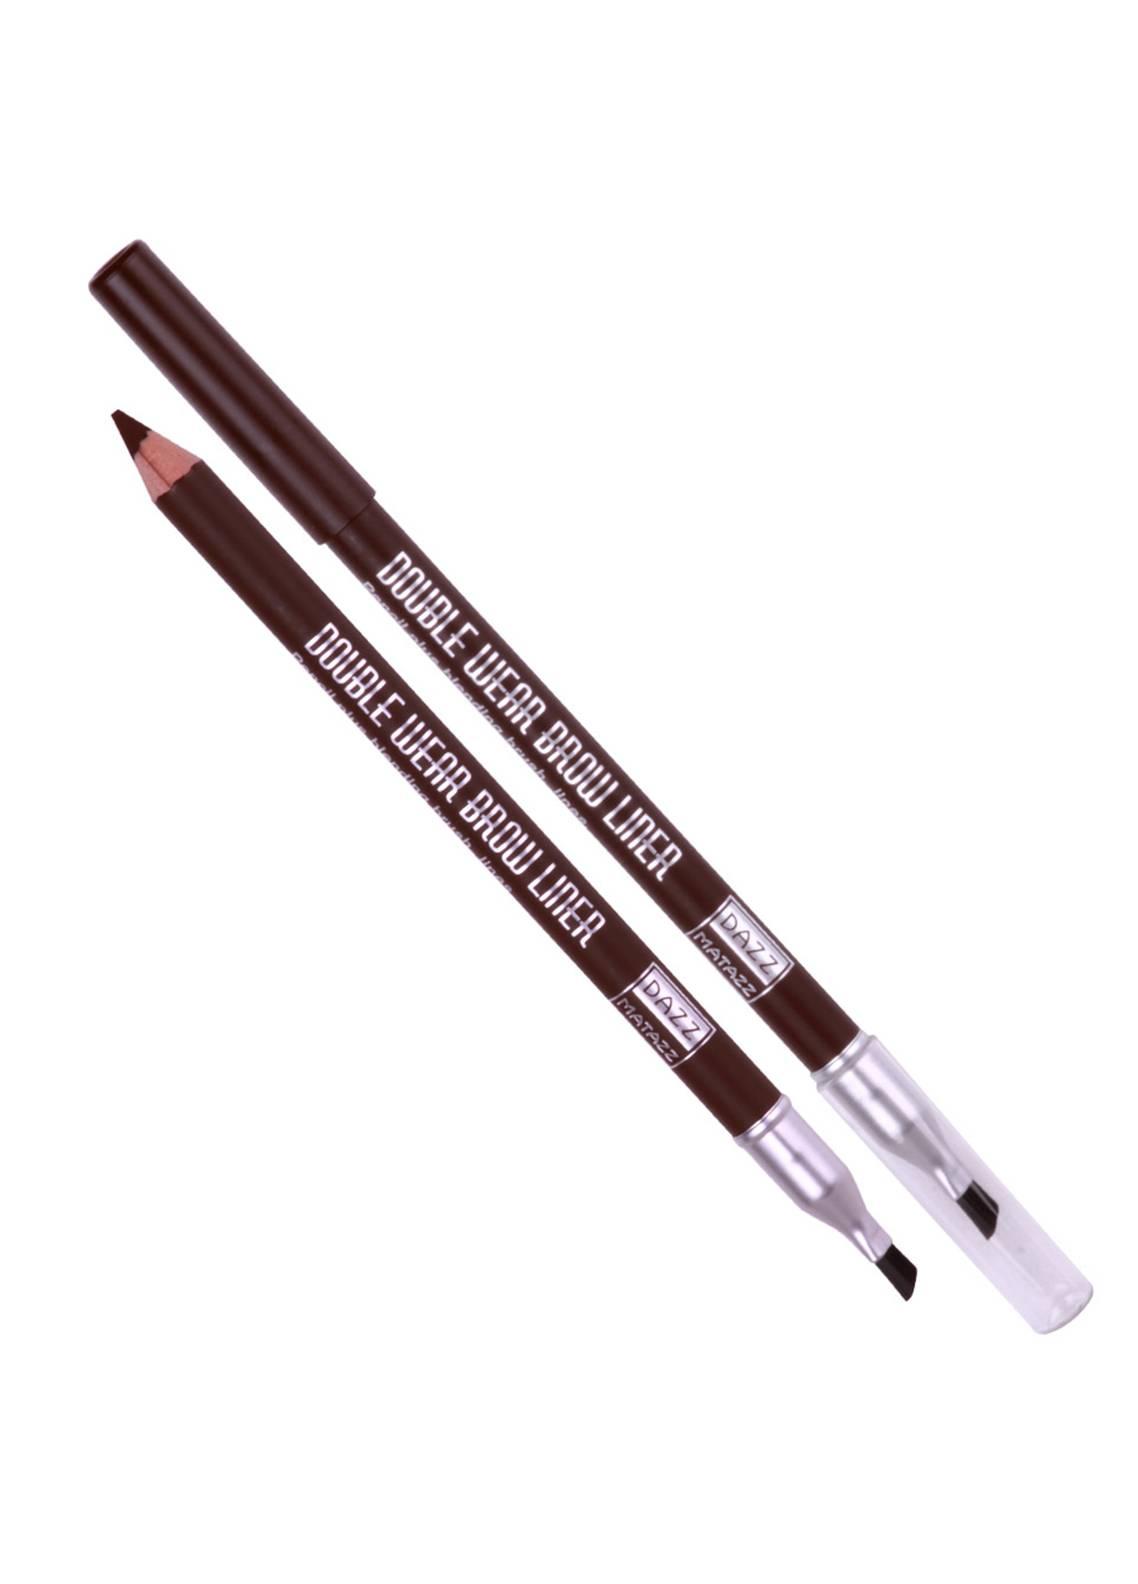 Dazz Matazz Double Wear Brow Liner-Brown